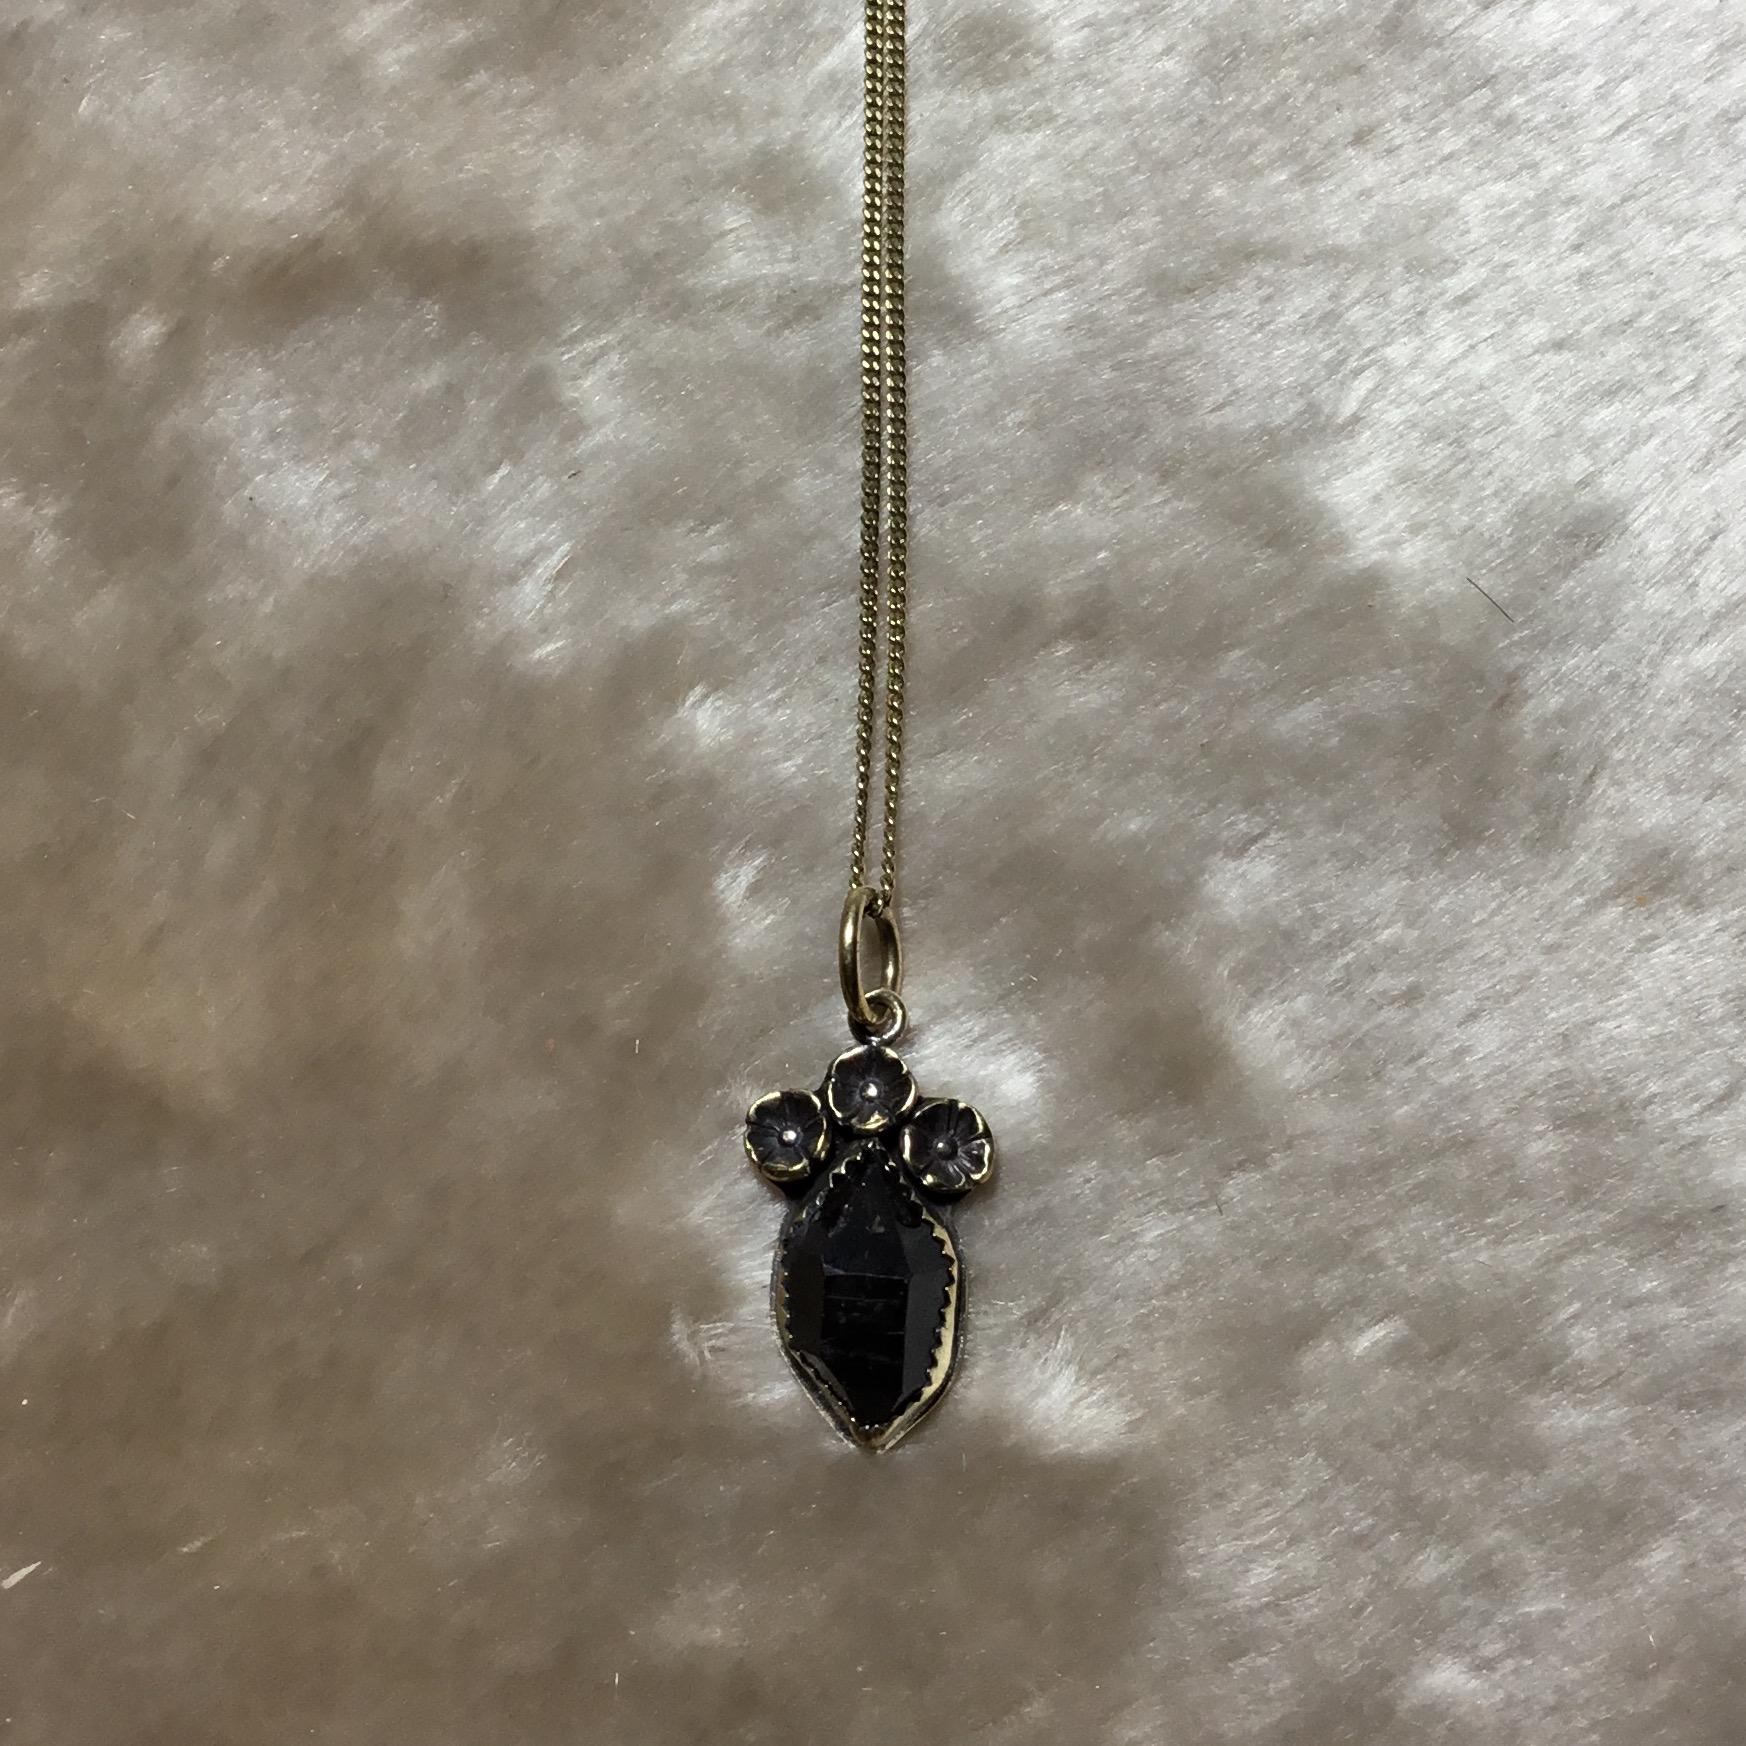 Floral crown crystal pendant in brass rish jewelry online store floral crown crystal pendant in brass aloadofball Gallery